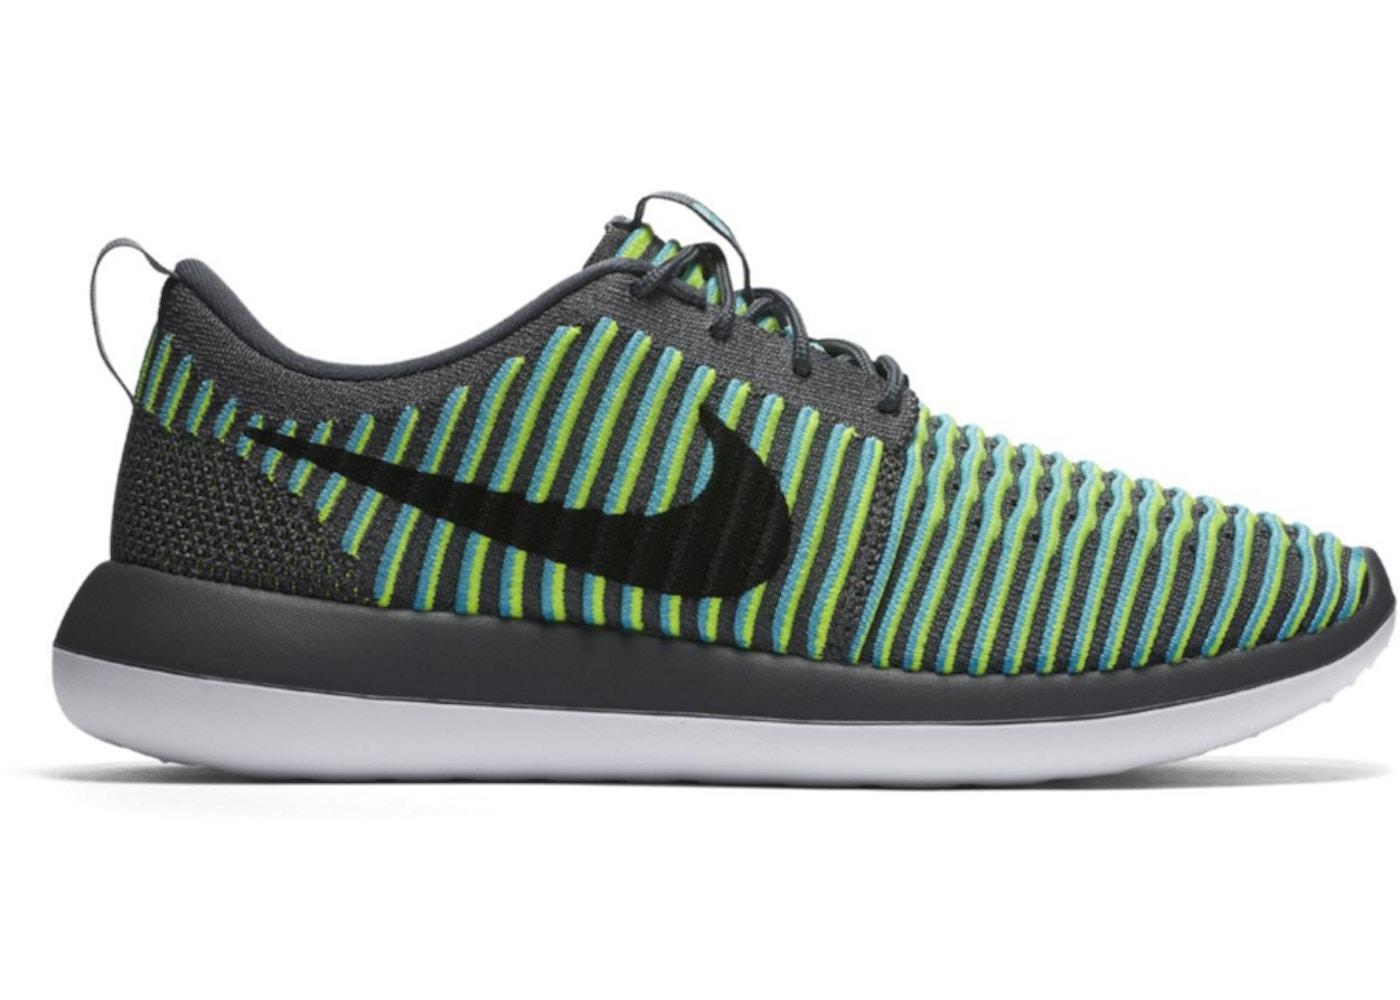 90f67bbd723dc Nike Roshe Two Flyknit Gamma Blue - 844833-004